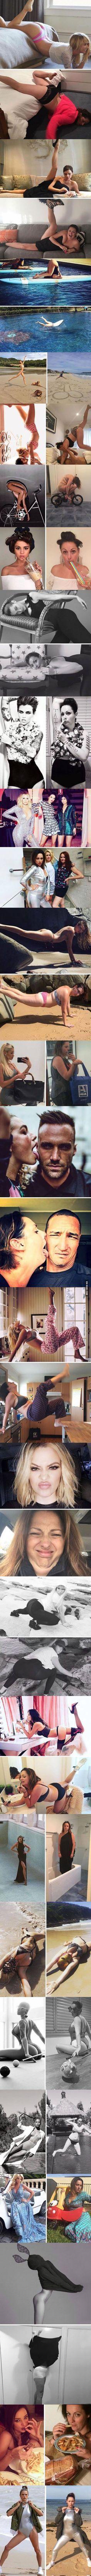 Woman reenacts celebrities photo